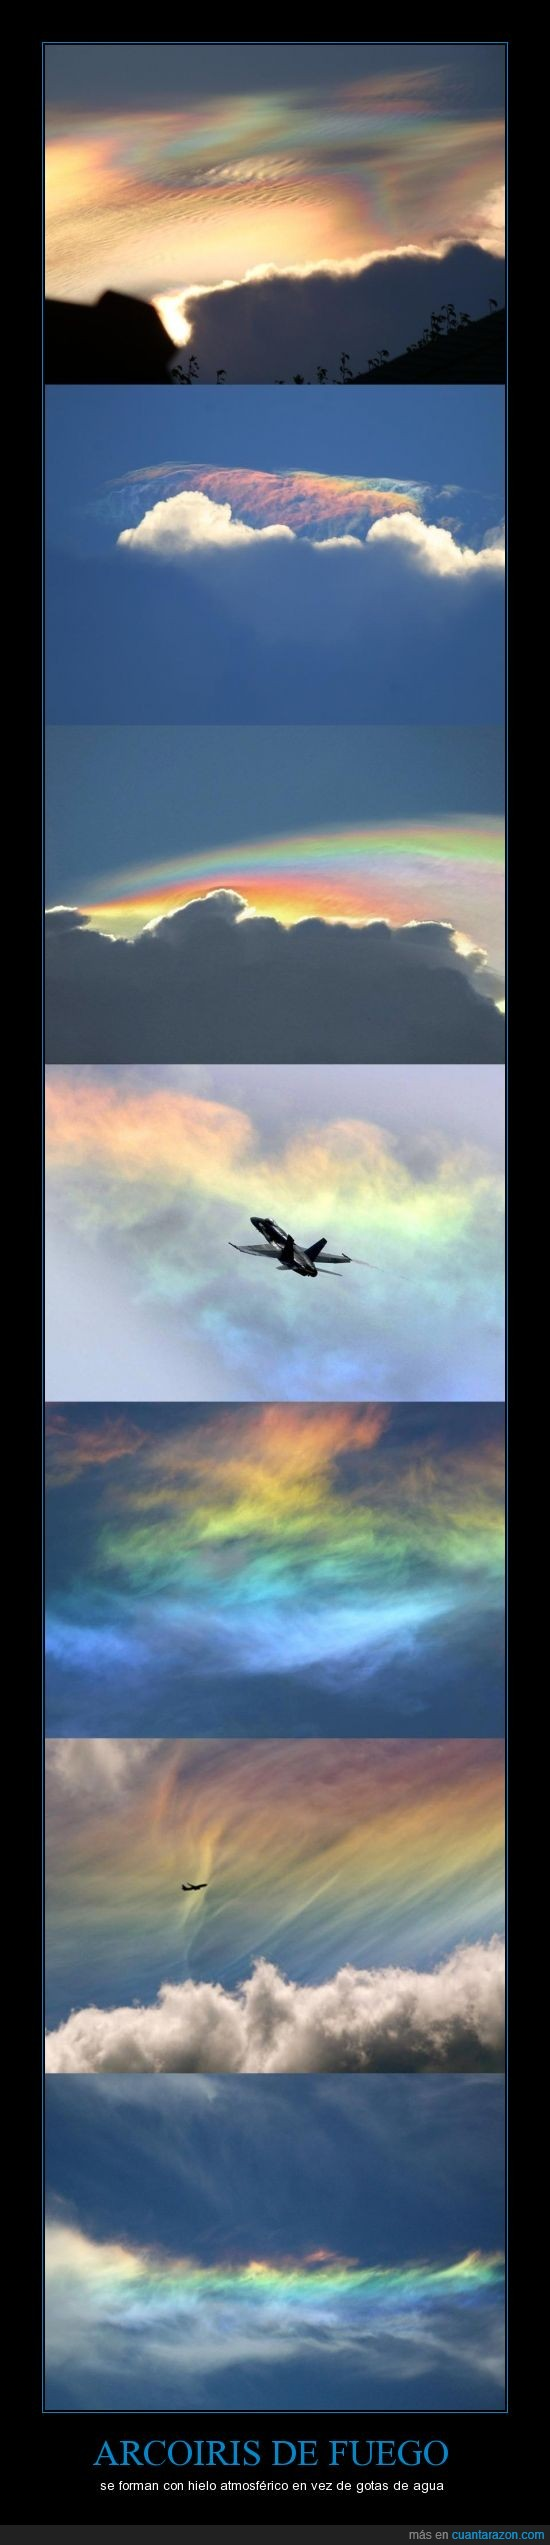 agua,arcoiris,arcoiris de fuego,cielo,colores,fuego,hielo,luz,nubes,sol